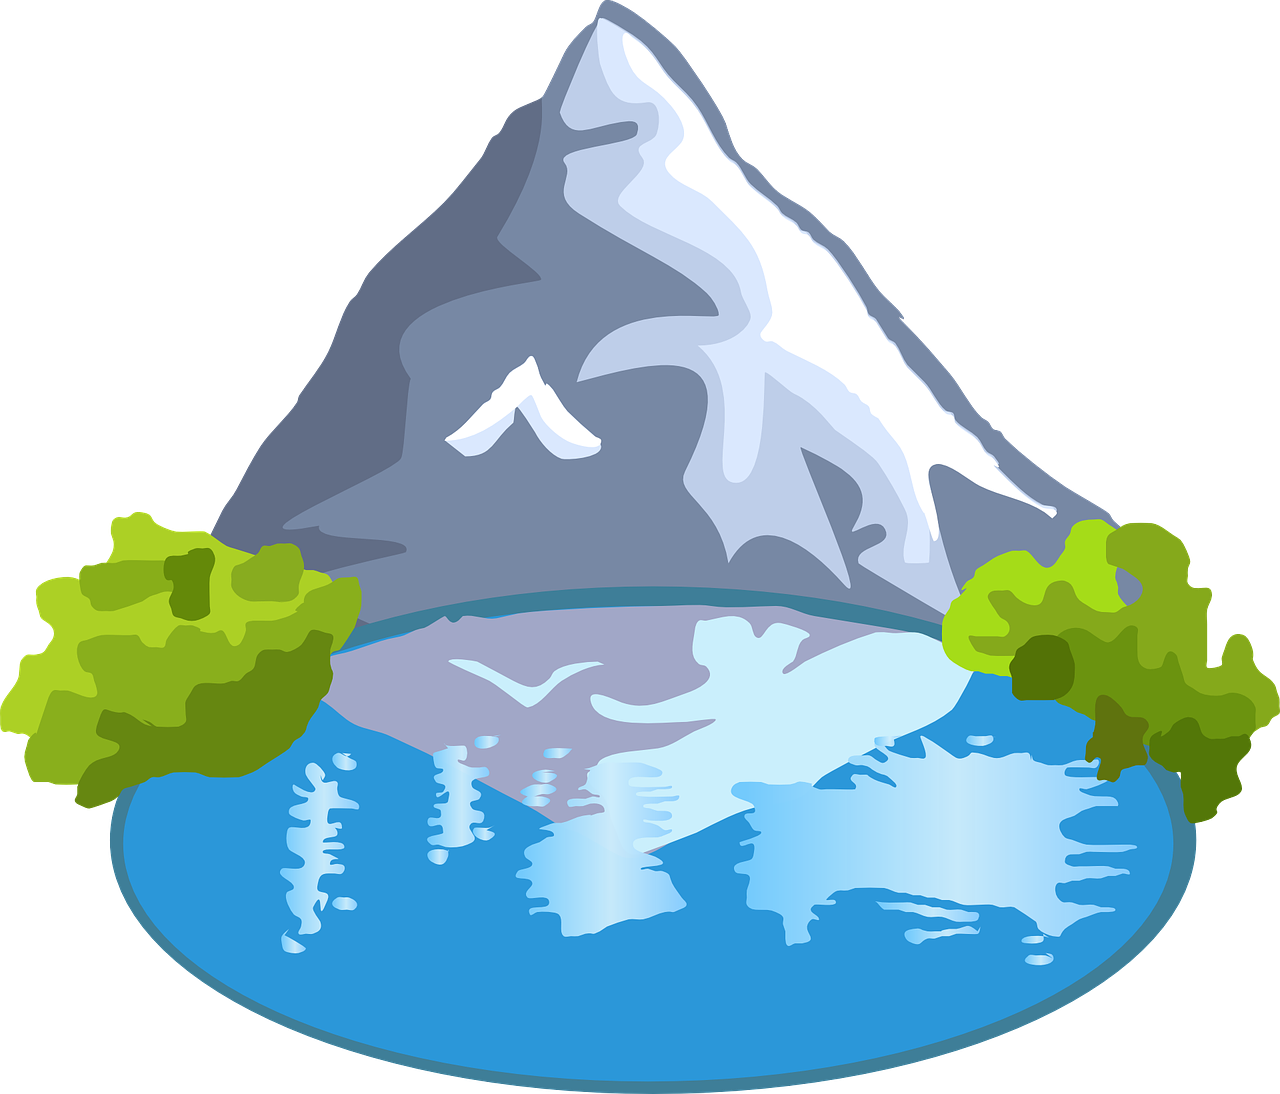 Clip art lake clipart image.